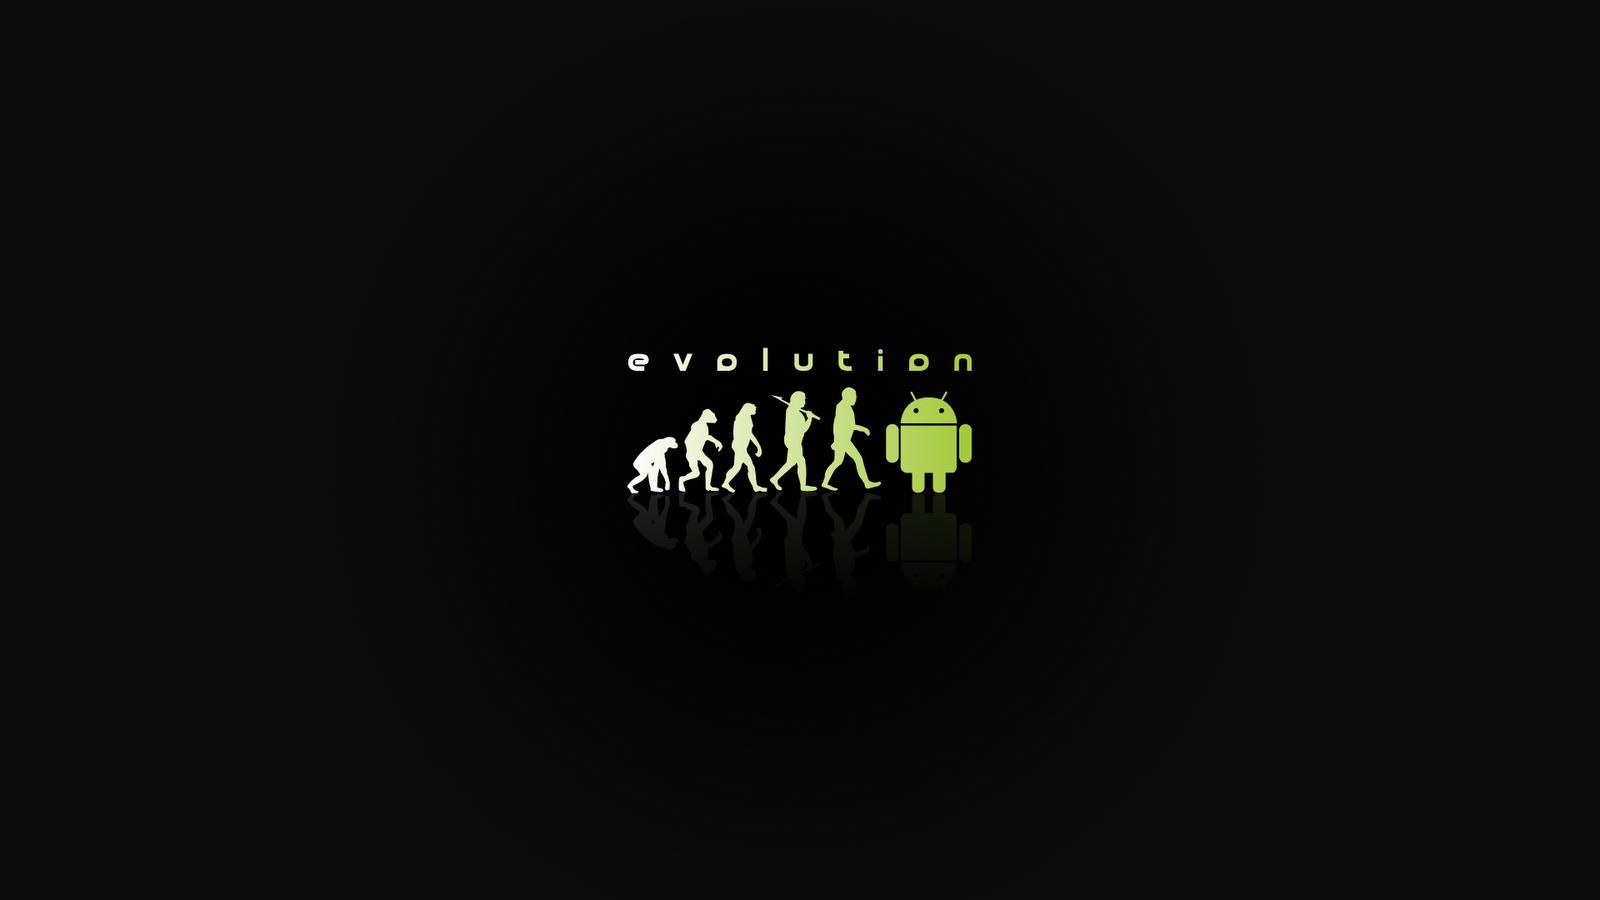 http://3.bp.blogspot.com/-bhqI83UfUN8/TZtG3x3cEpI/AAAAAAAAH24/IQYWzmrAPyw/s1600/androidEvolution1920x1080.png